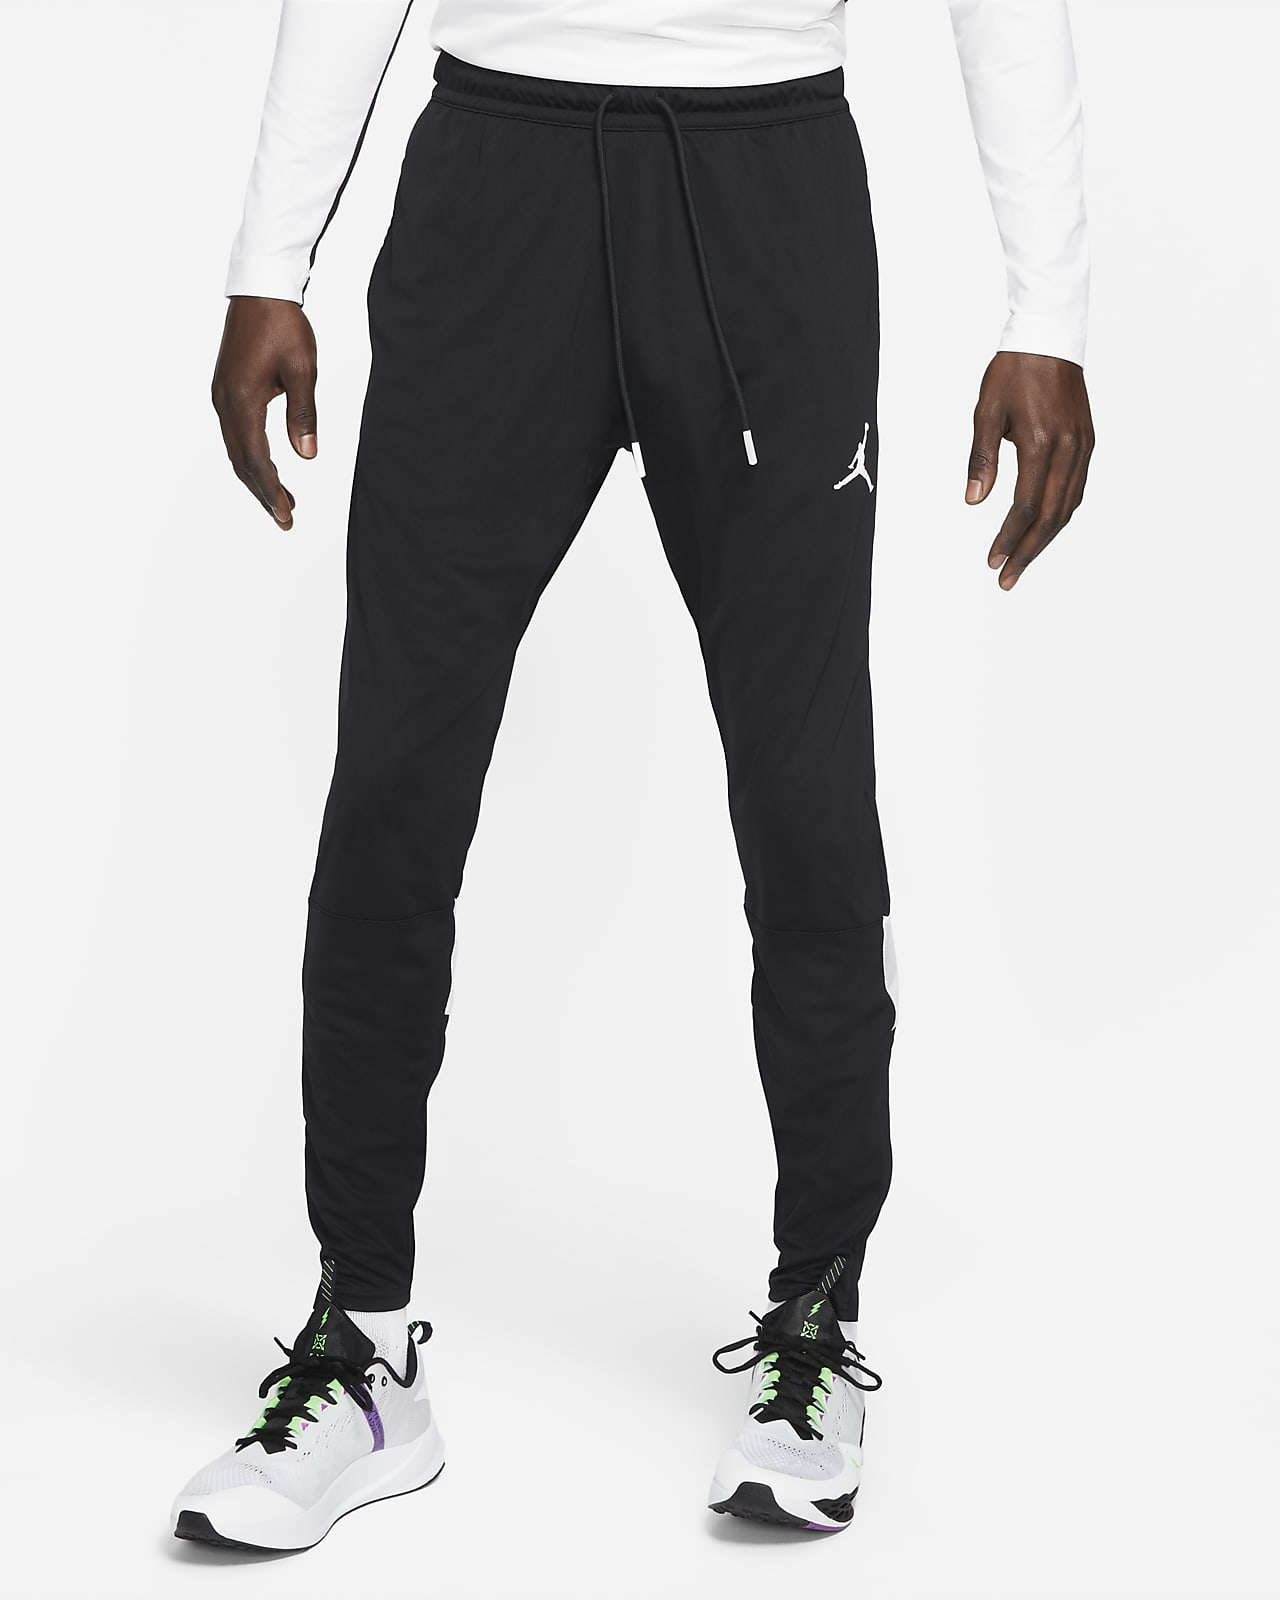 Jordan Dri-FIT Air Pantalons - Home